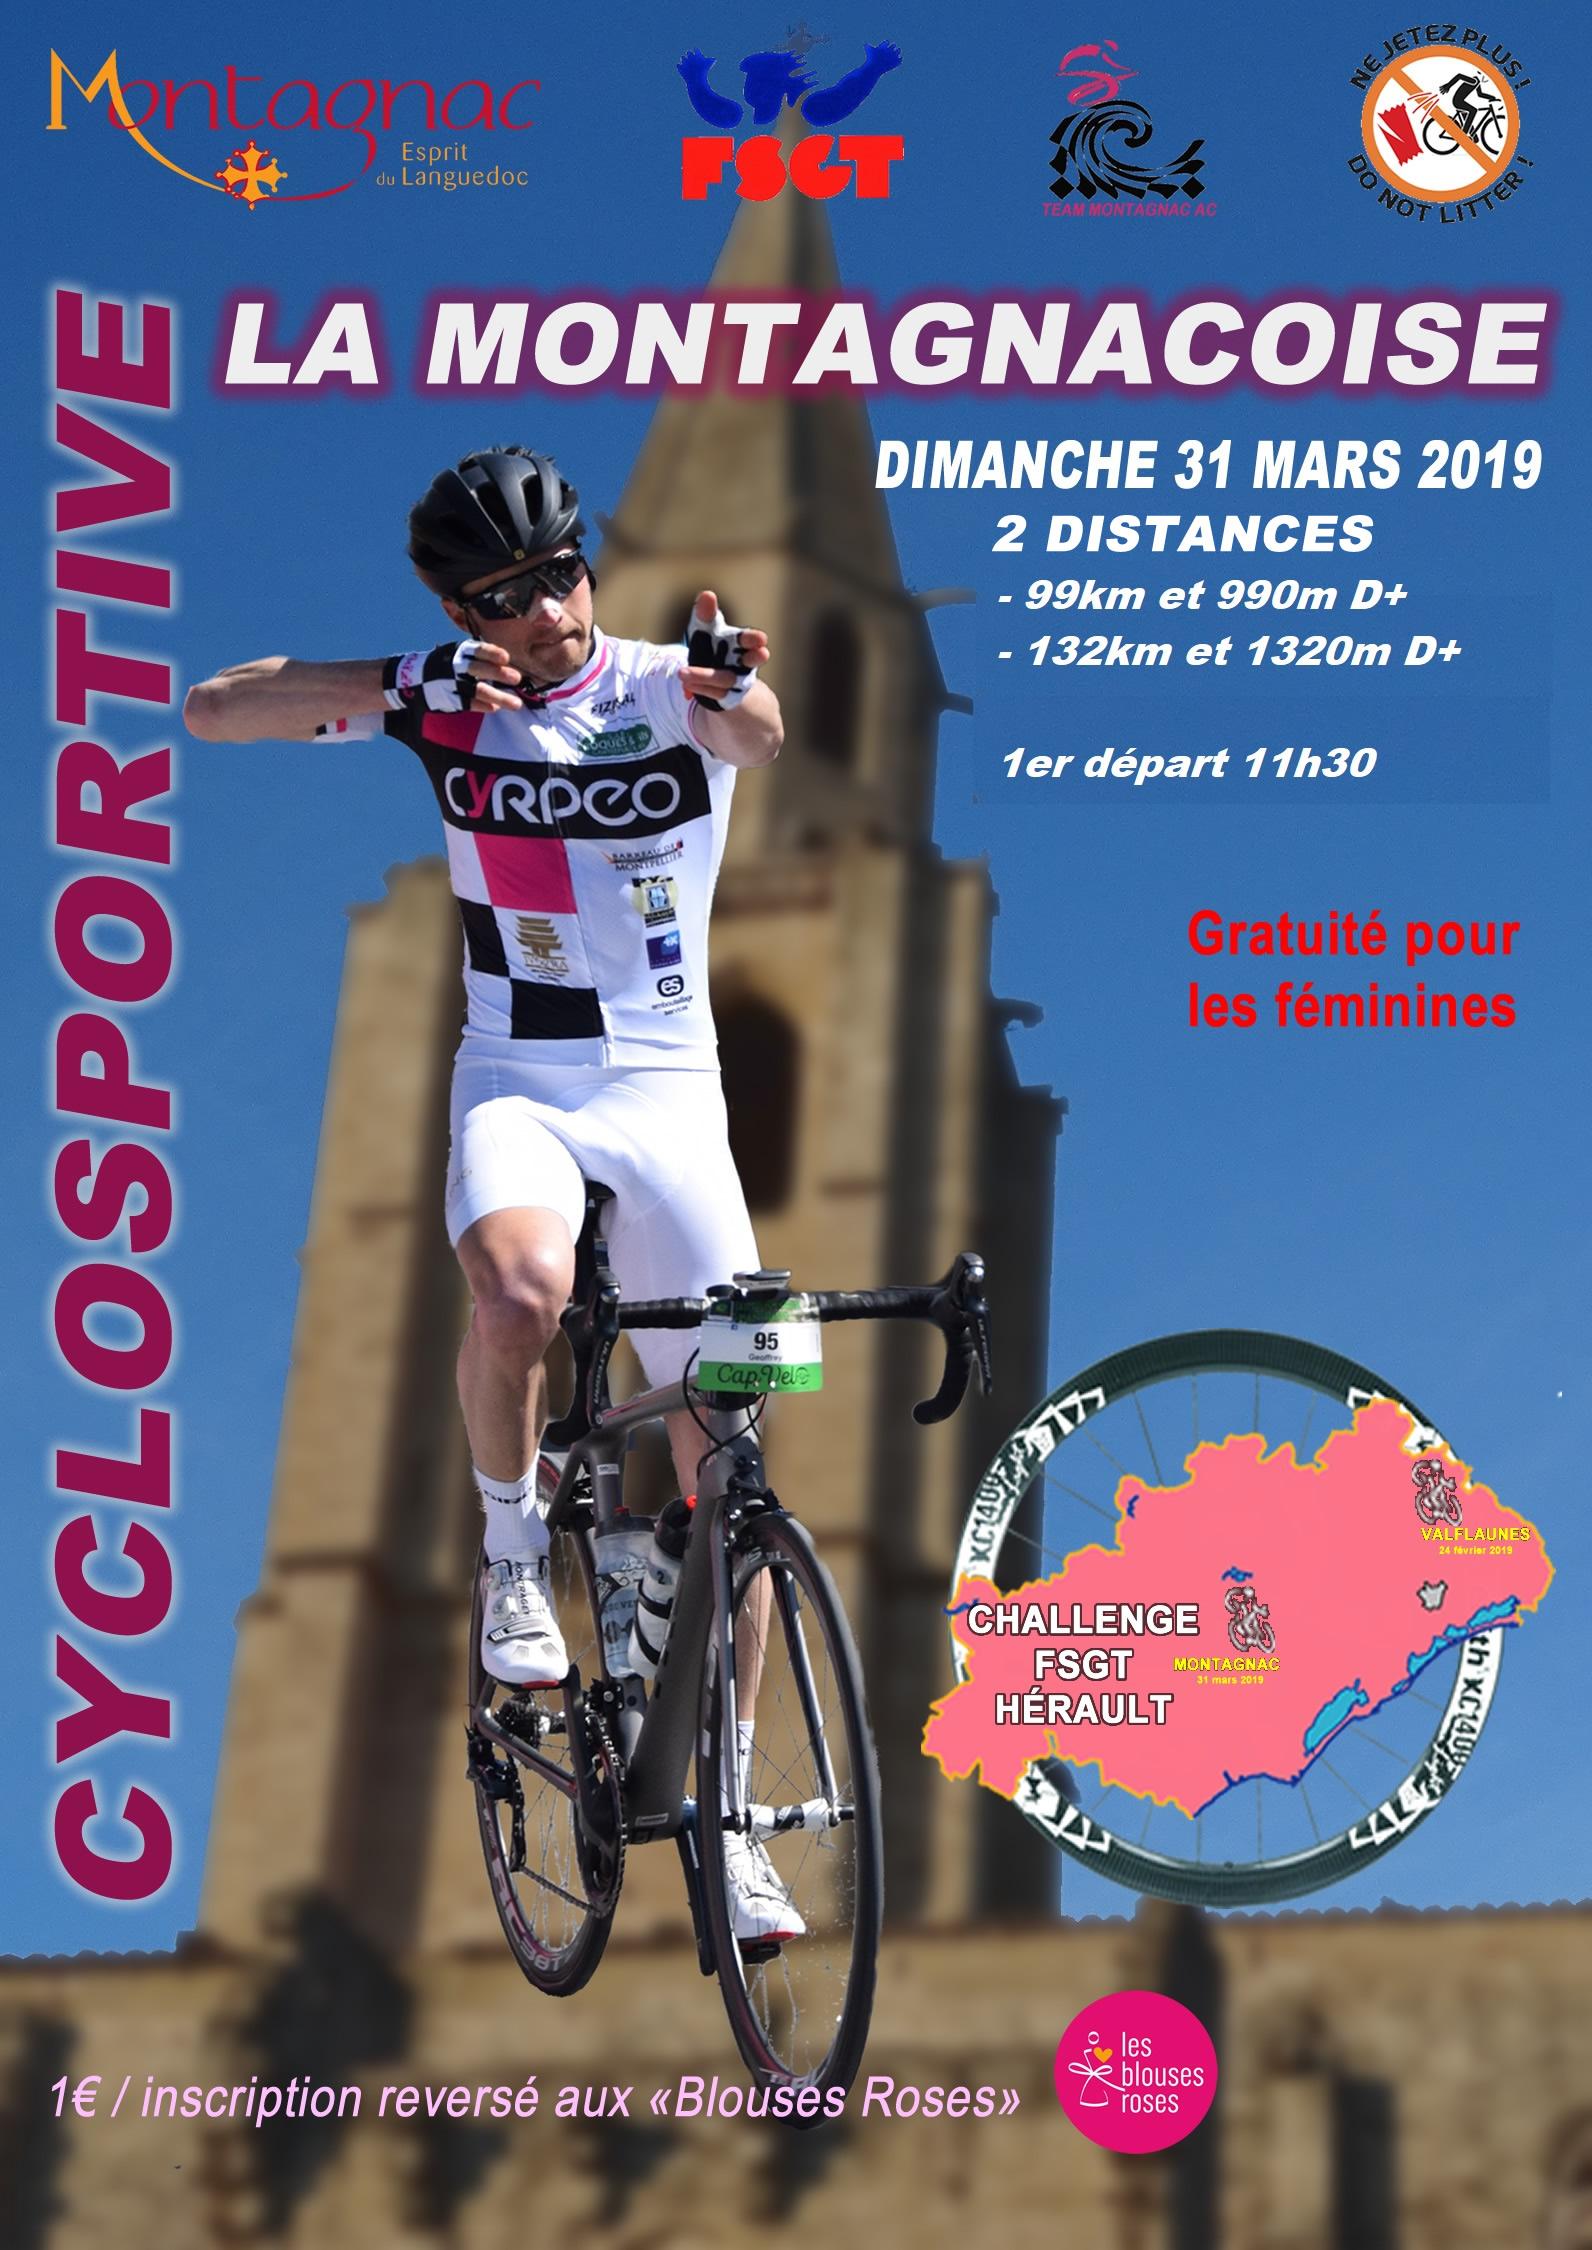 Cyclosportive Calendrier.Ats Sport Cyclosportive La Montagnacoise